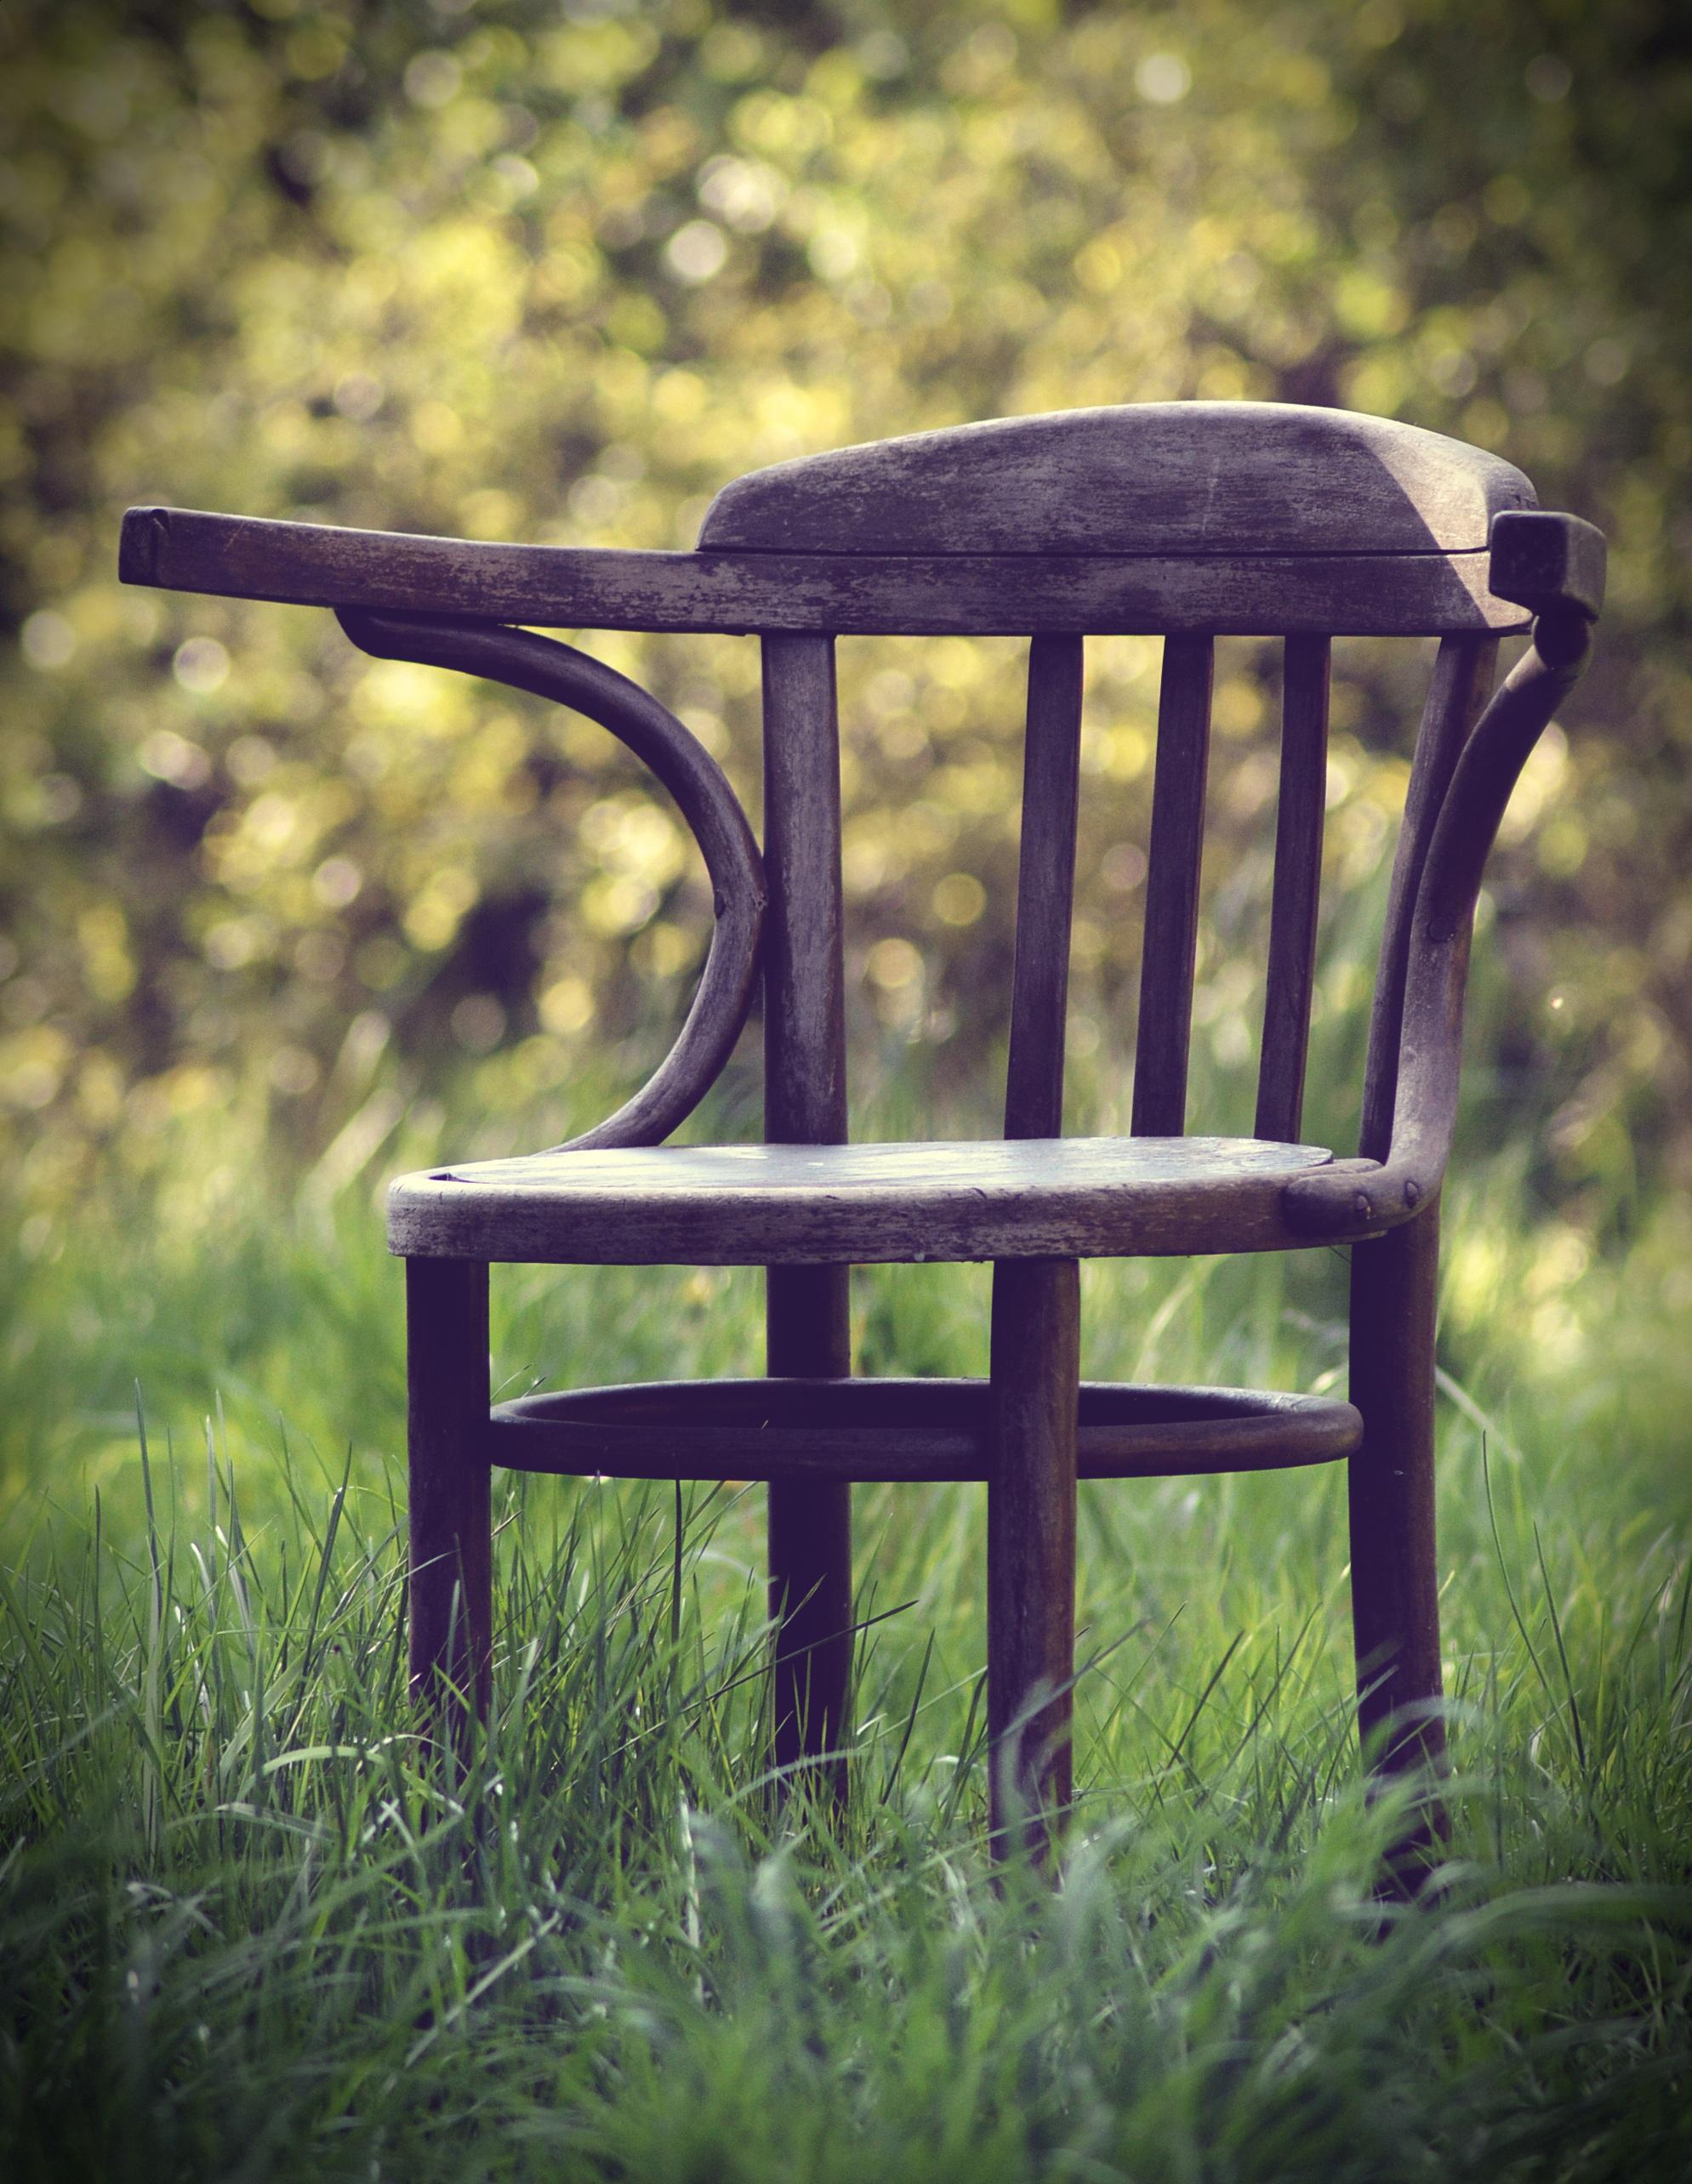 Images Gratuites : table, herbe, cru, vert, meubles, jardin ...